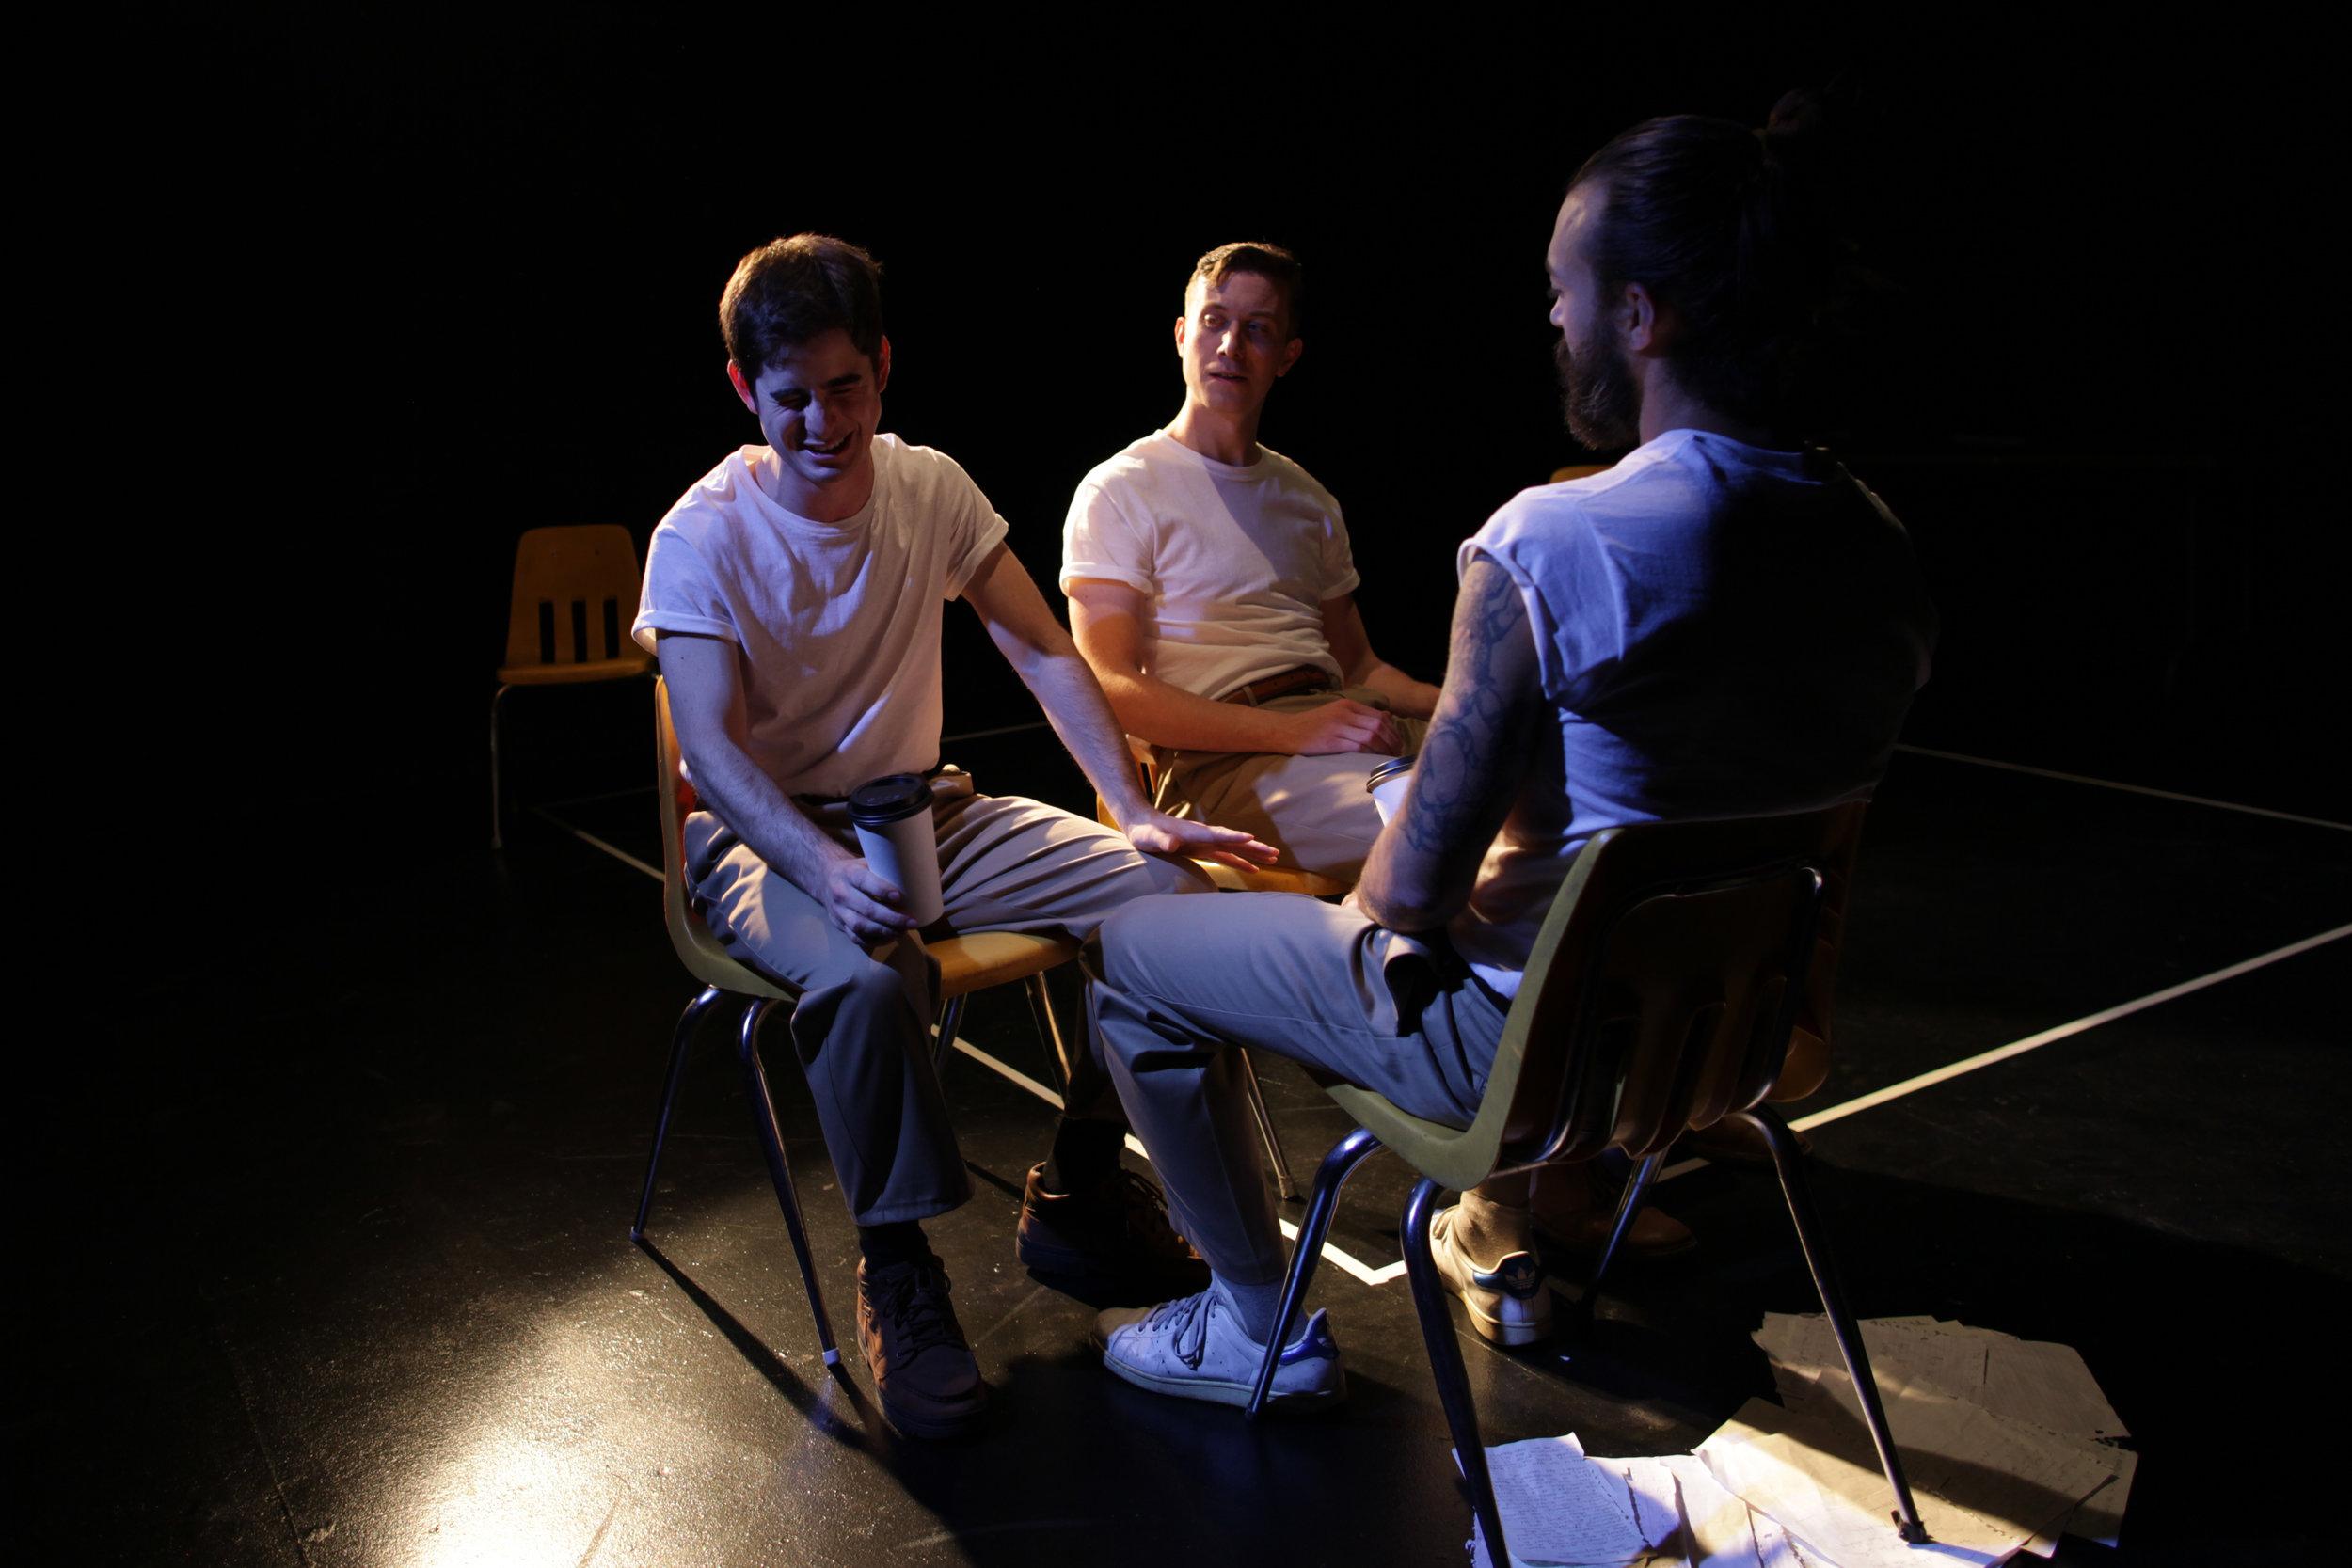 photo by  Suzi Sadler   featuring  Jonathan Gordon , Michael Barringer and  Merlin Whitehawk